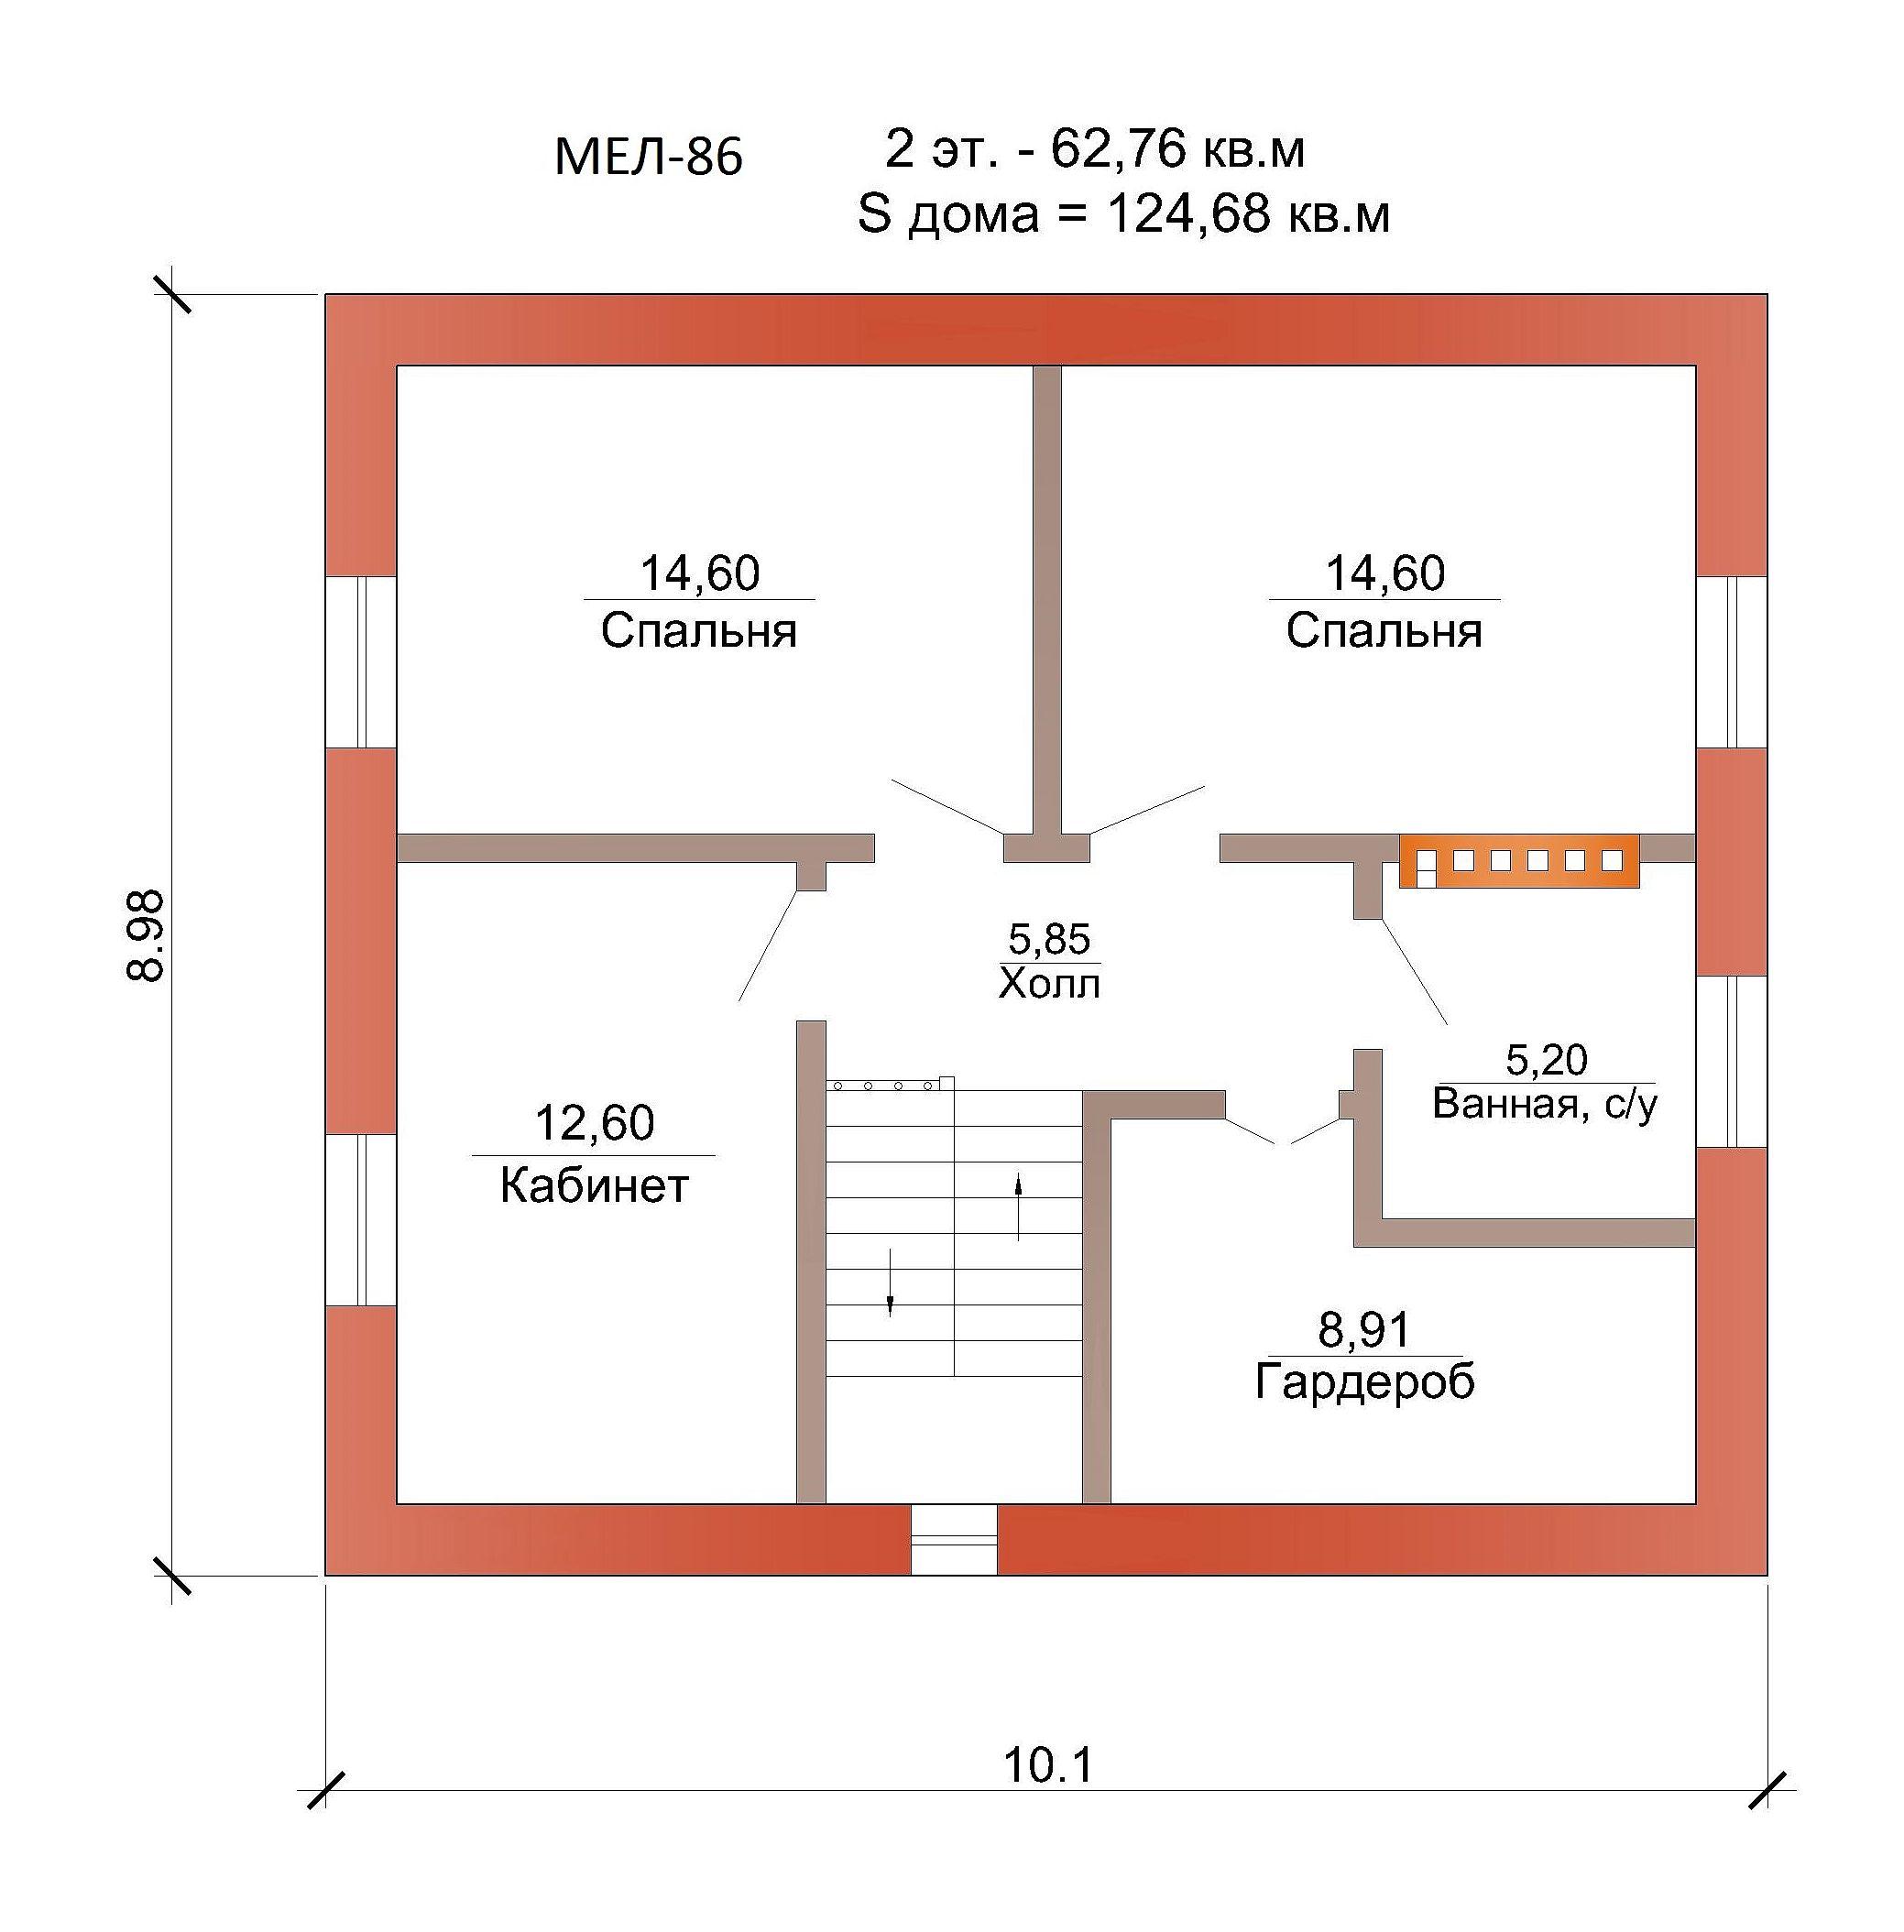 Готовый проект коттеджа 124 кв. м / Артикул Мел-86 план